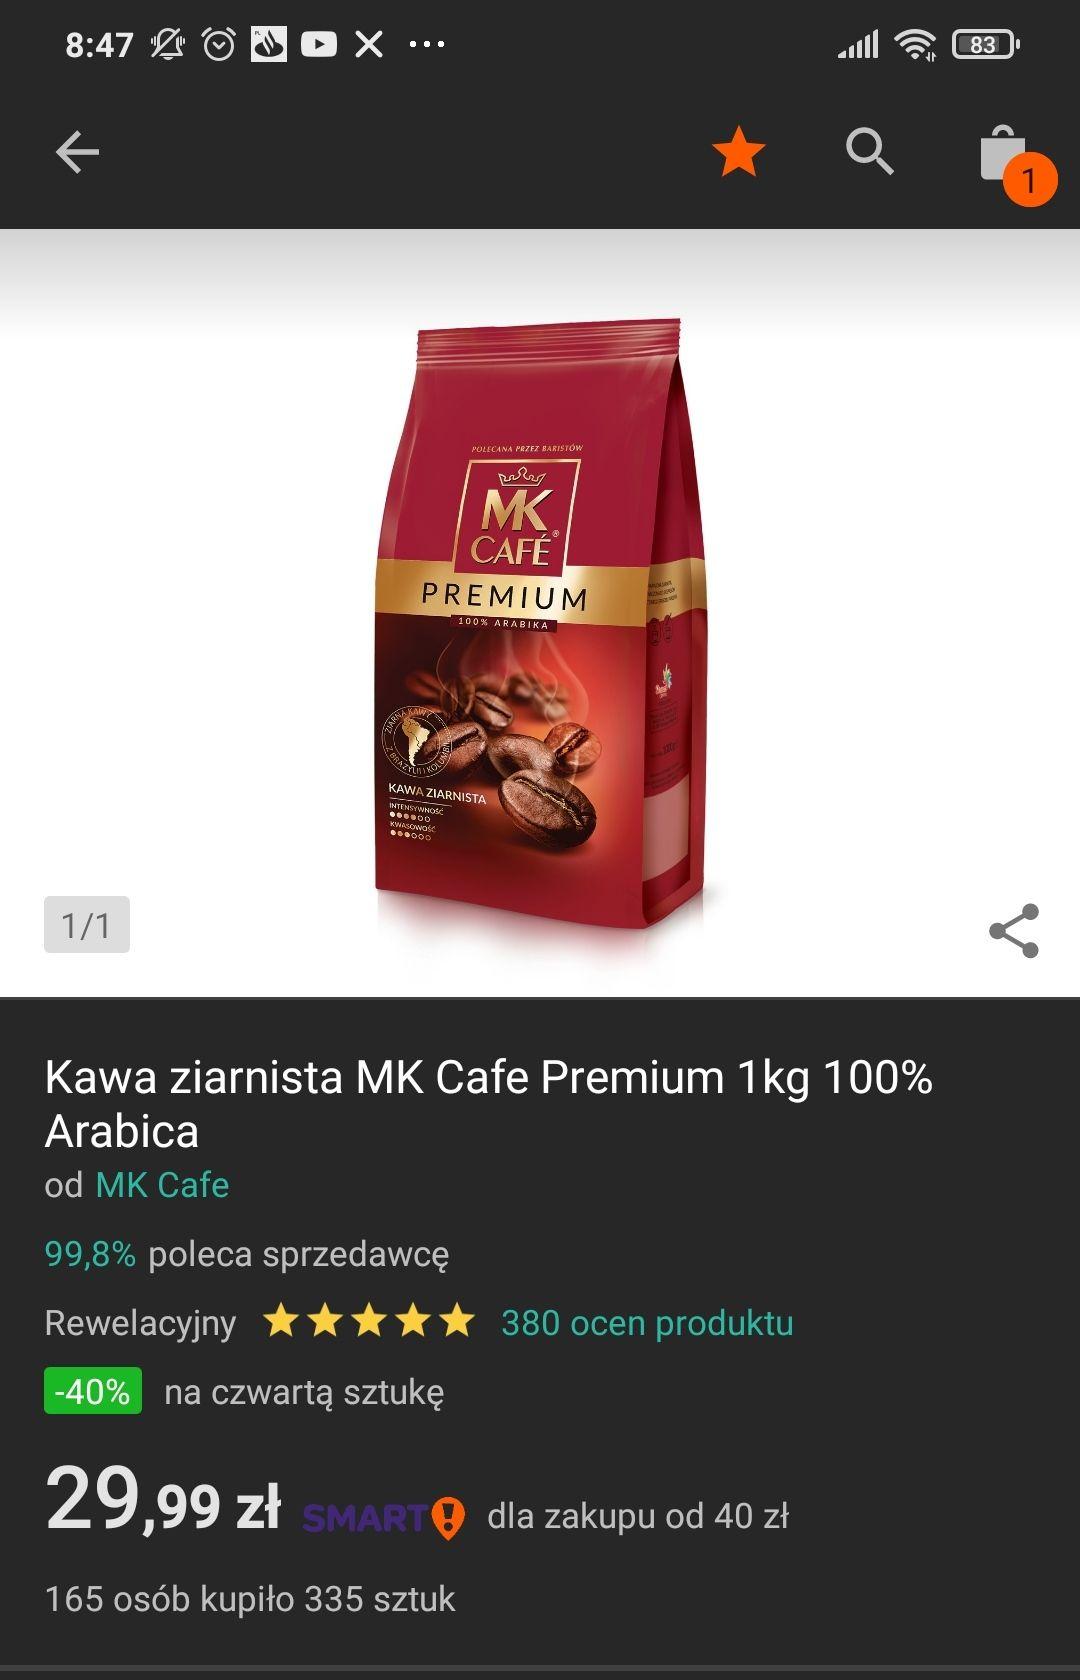 MK Cafe Premium kawa ziarnista 1kg od oficjalnego sklepu